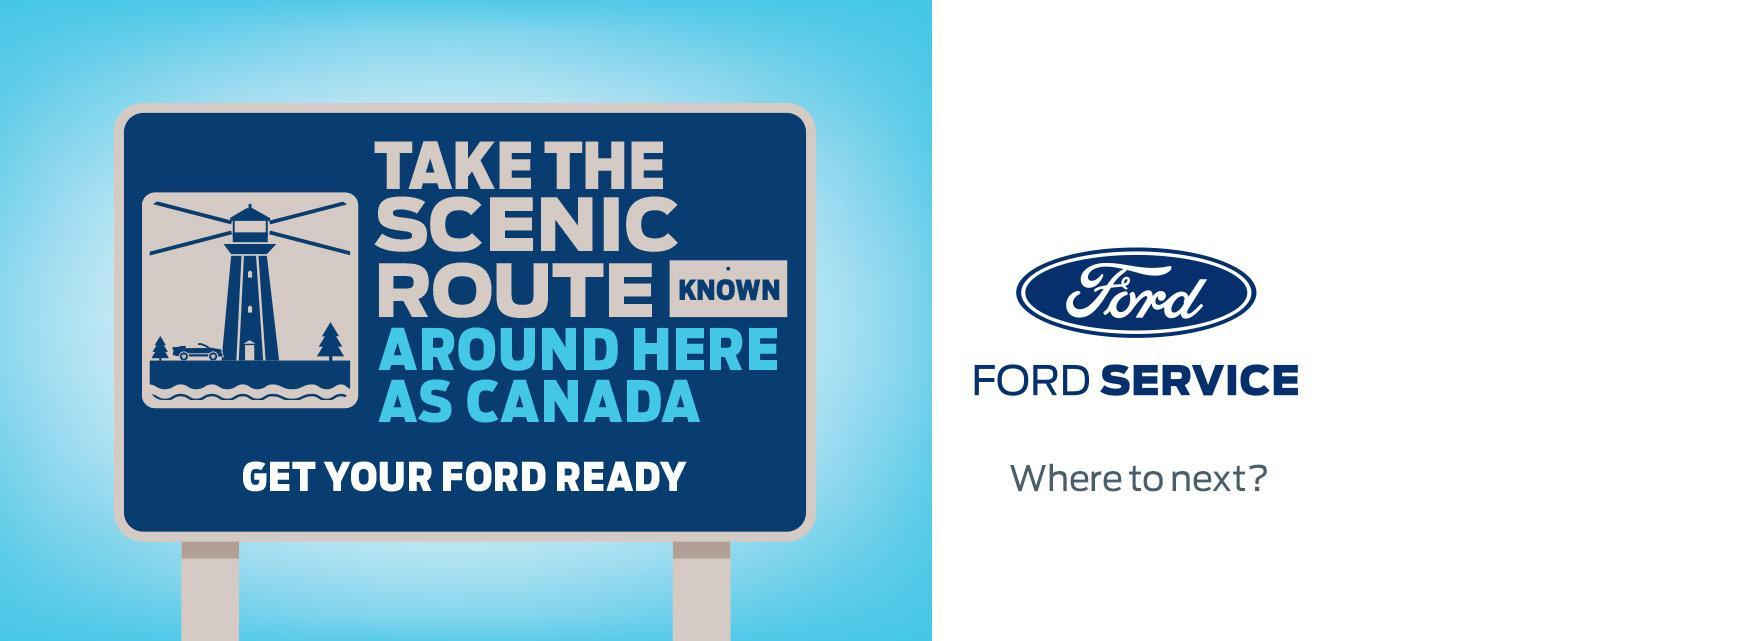 service online san ford diego parts dealer department